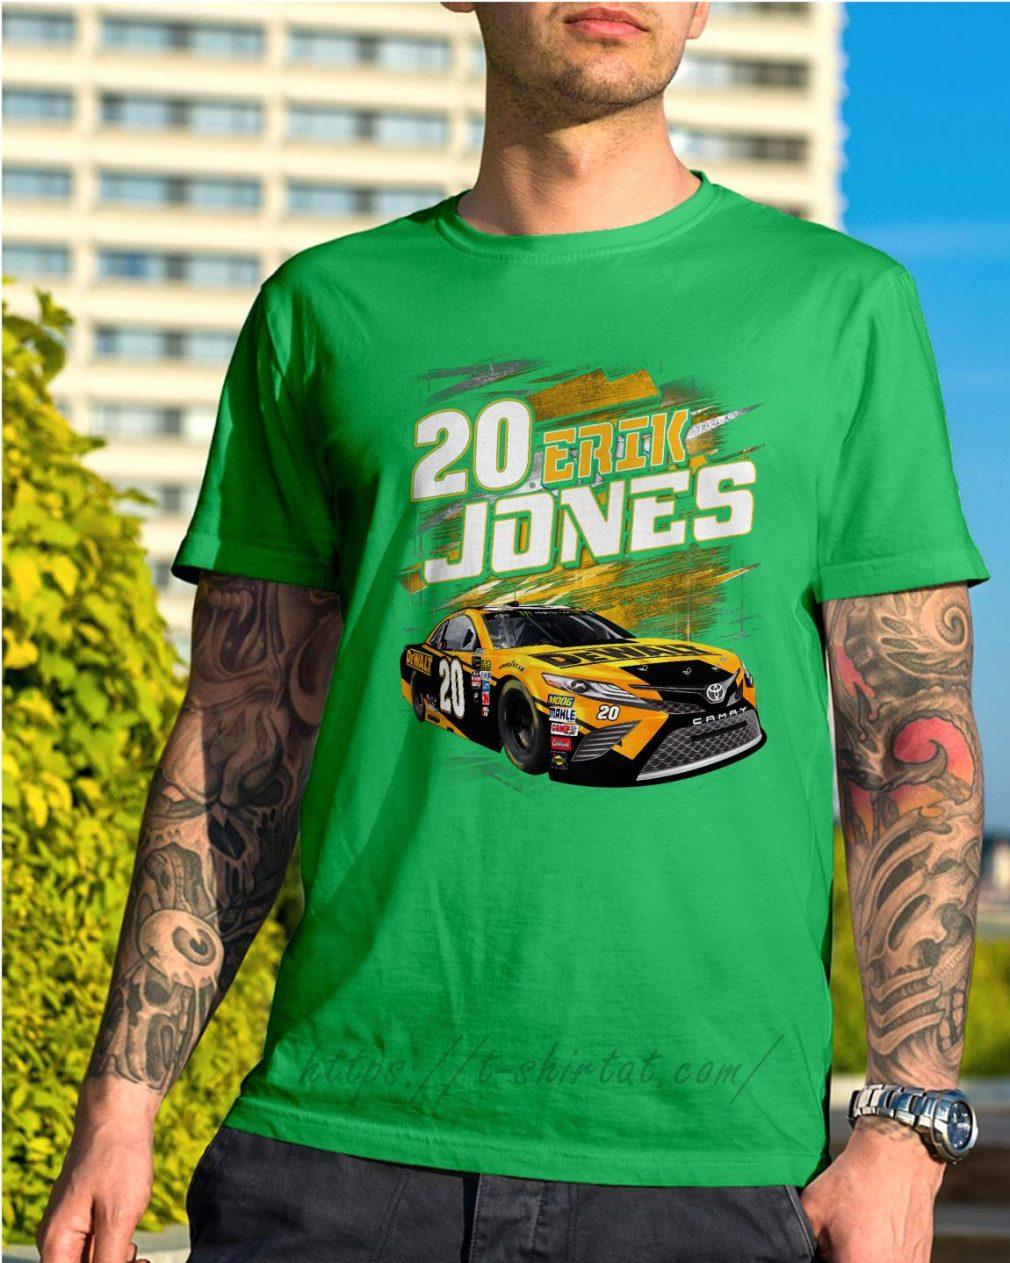 20 Erik Jones Black Dewalt power car Shirt green